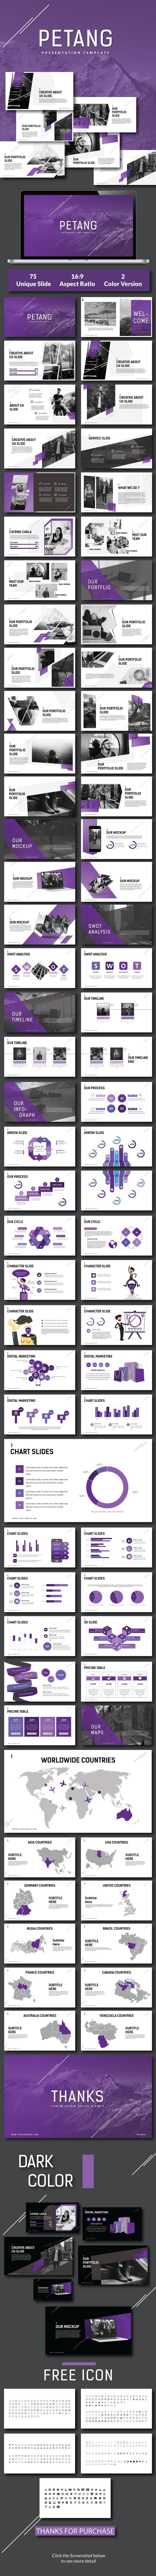 GraphicRiver Petang Creative Presentation Template 20992885